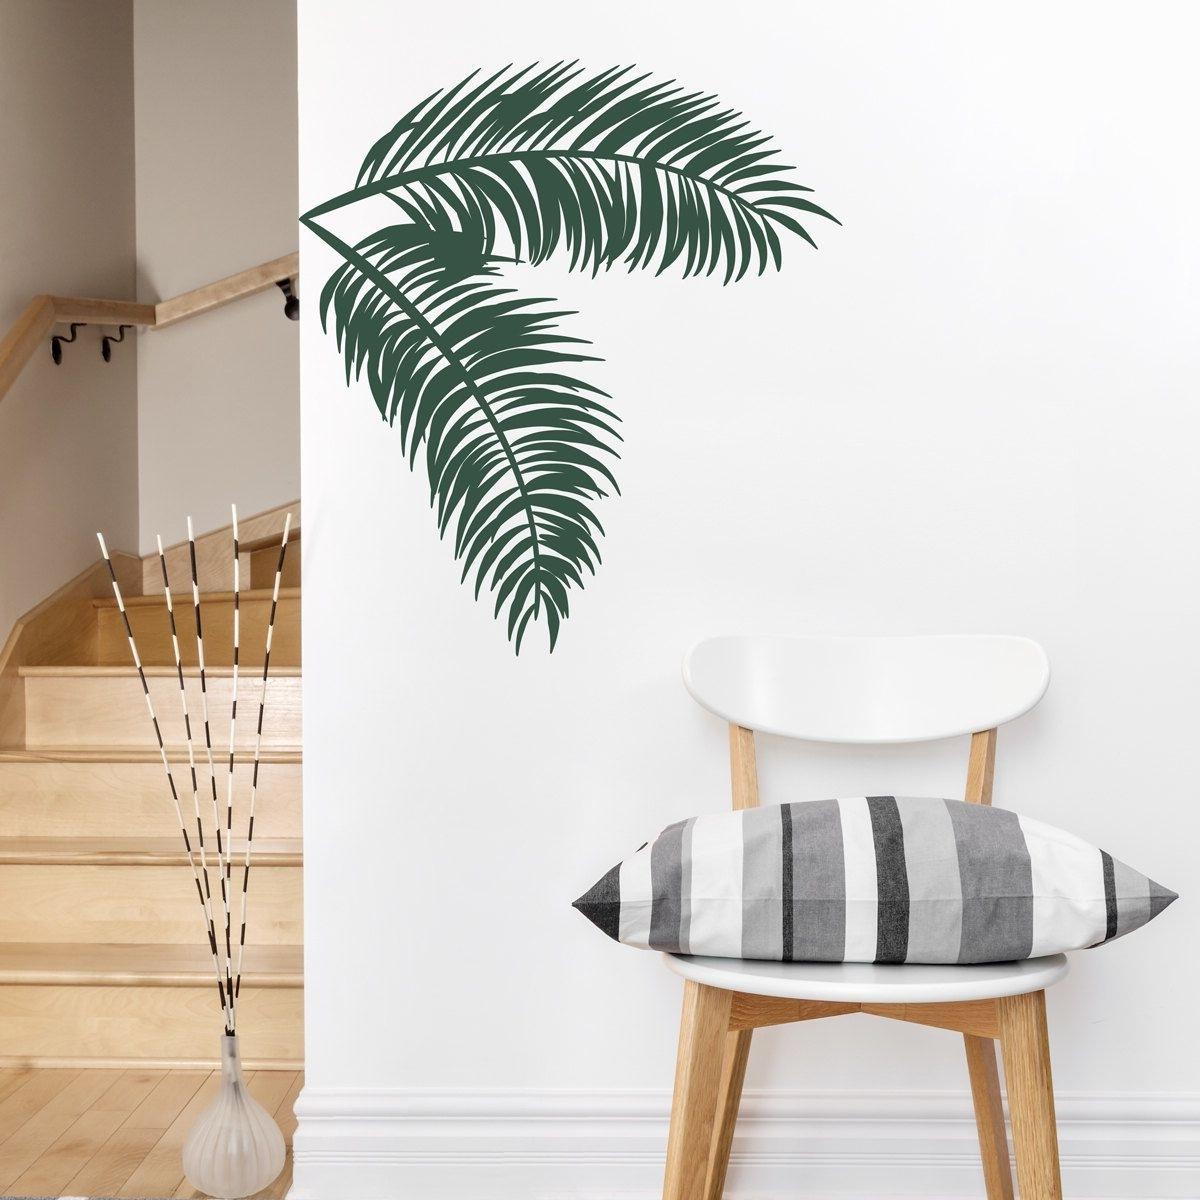 Palm Leaves Wall Decal Tropical Wall Art, Palm Tree Decal, Hawaiian Inside Well Liked Palm Tree Wall Art (View 2 of 15)